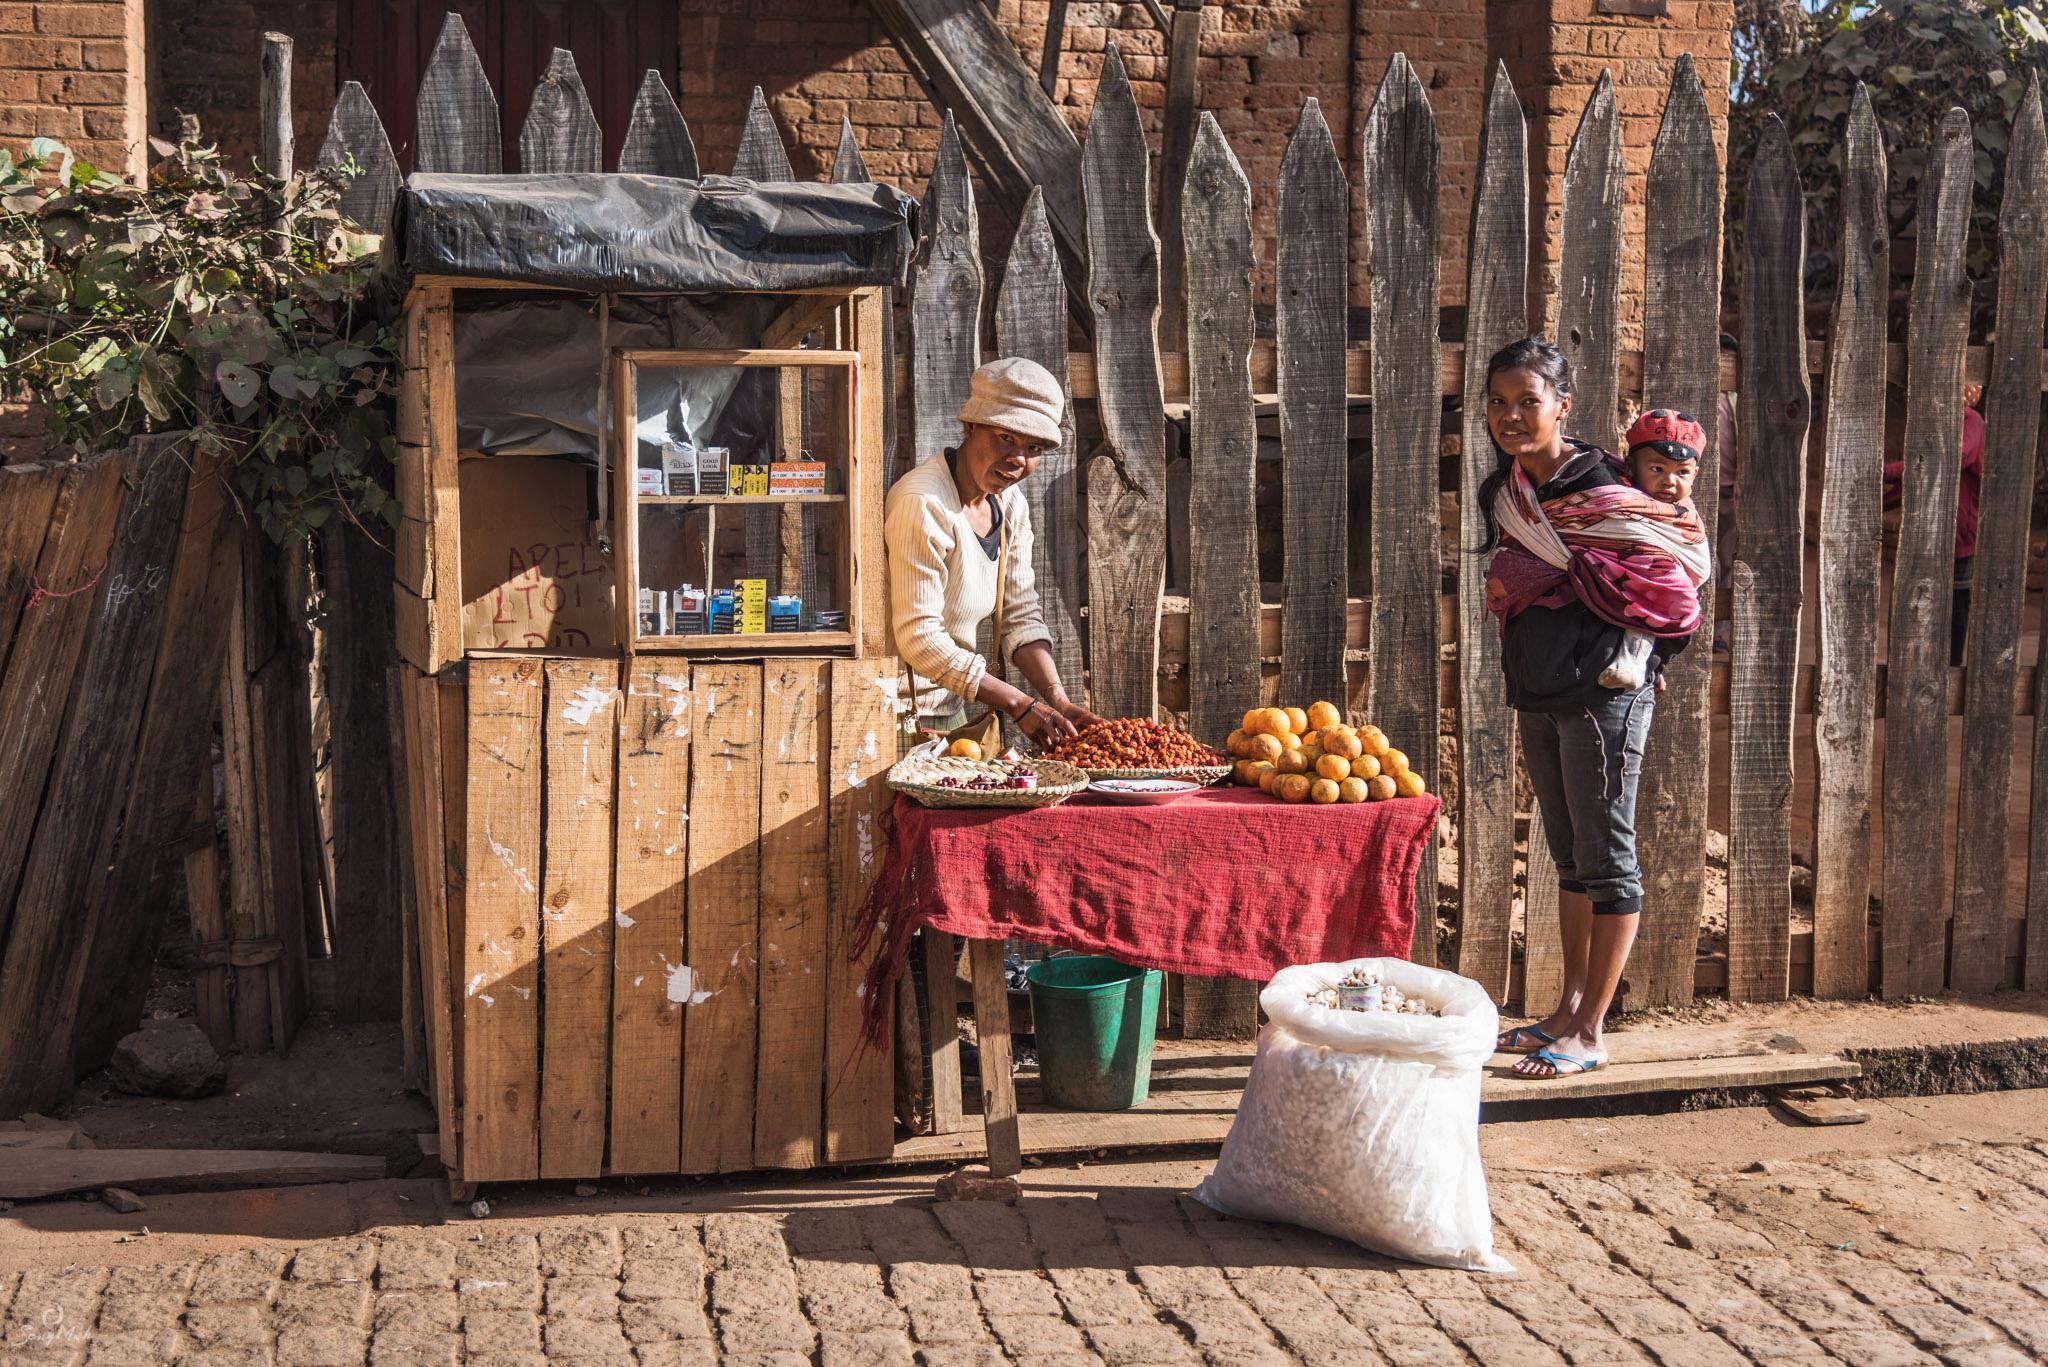 Antsirabe street scene